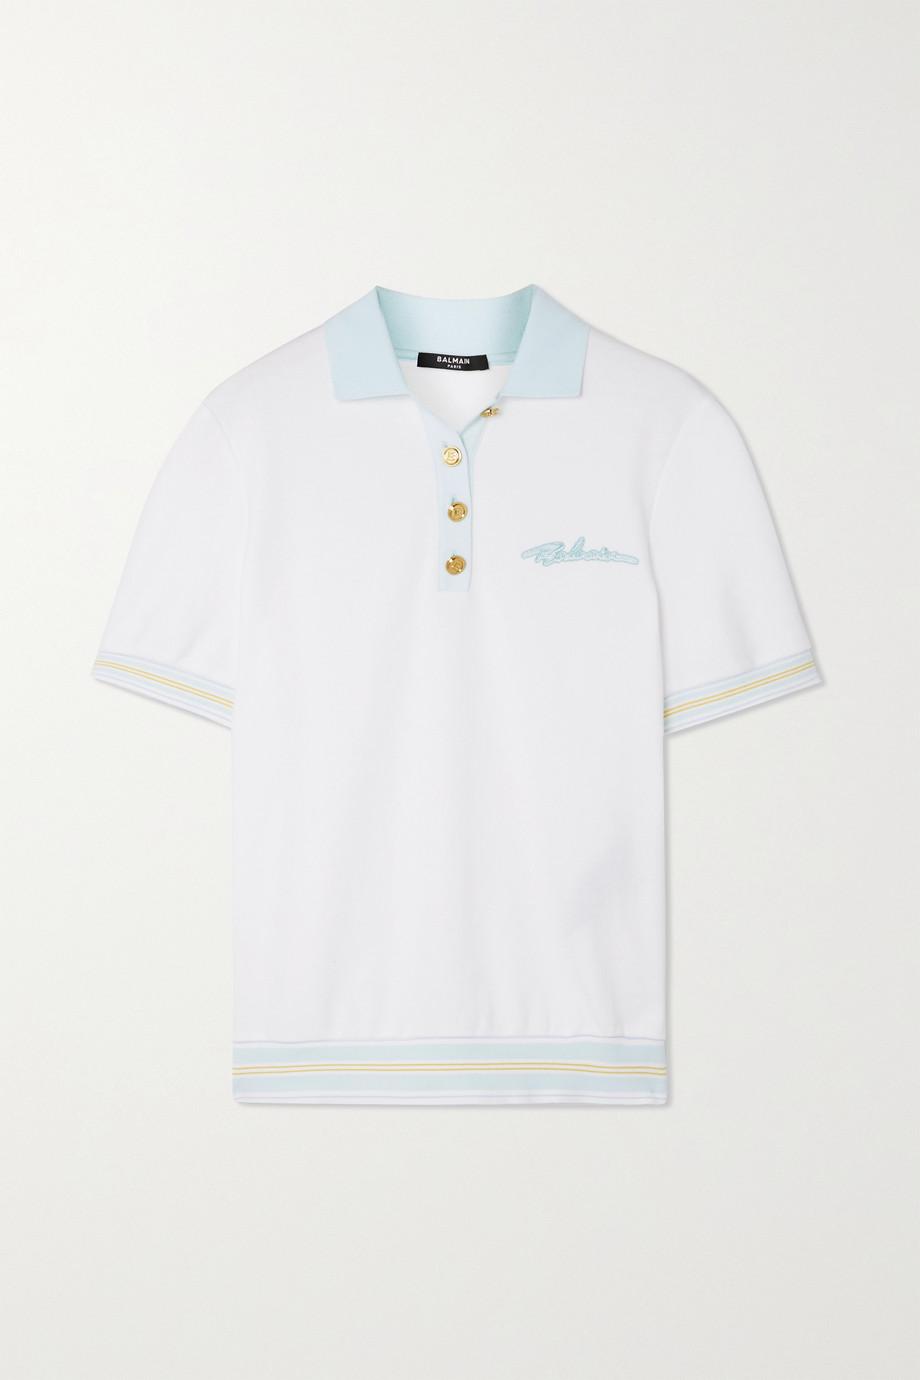 Balmain Polohemd aus Baumwoll-Jersey mit Stickerei